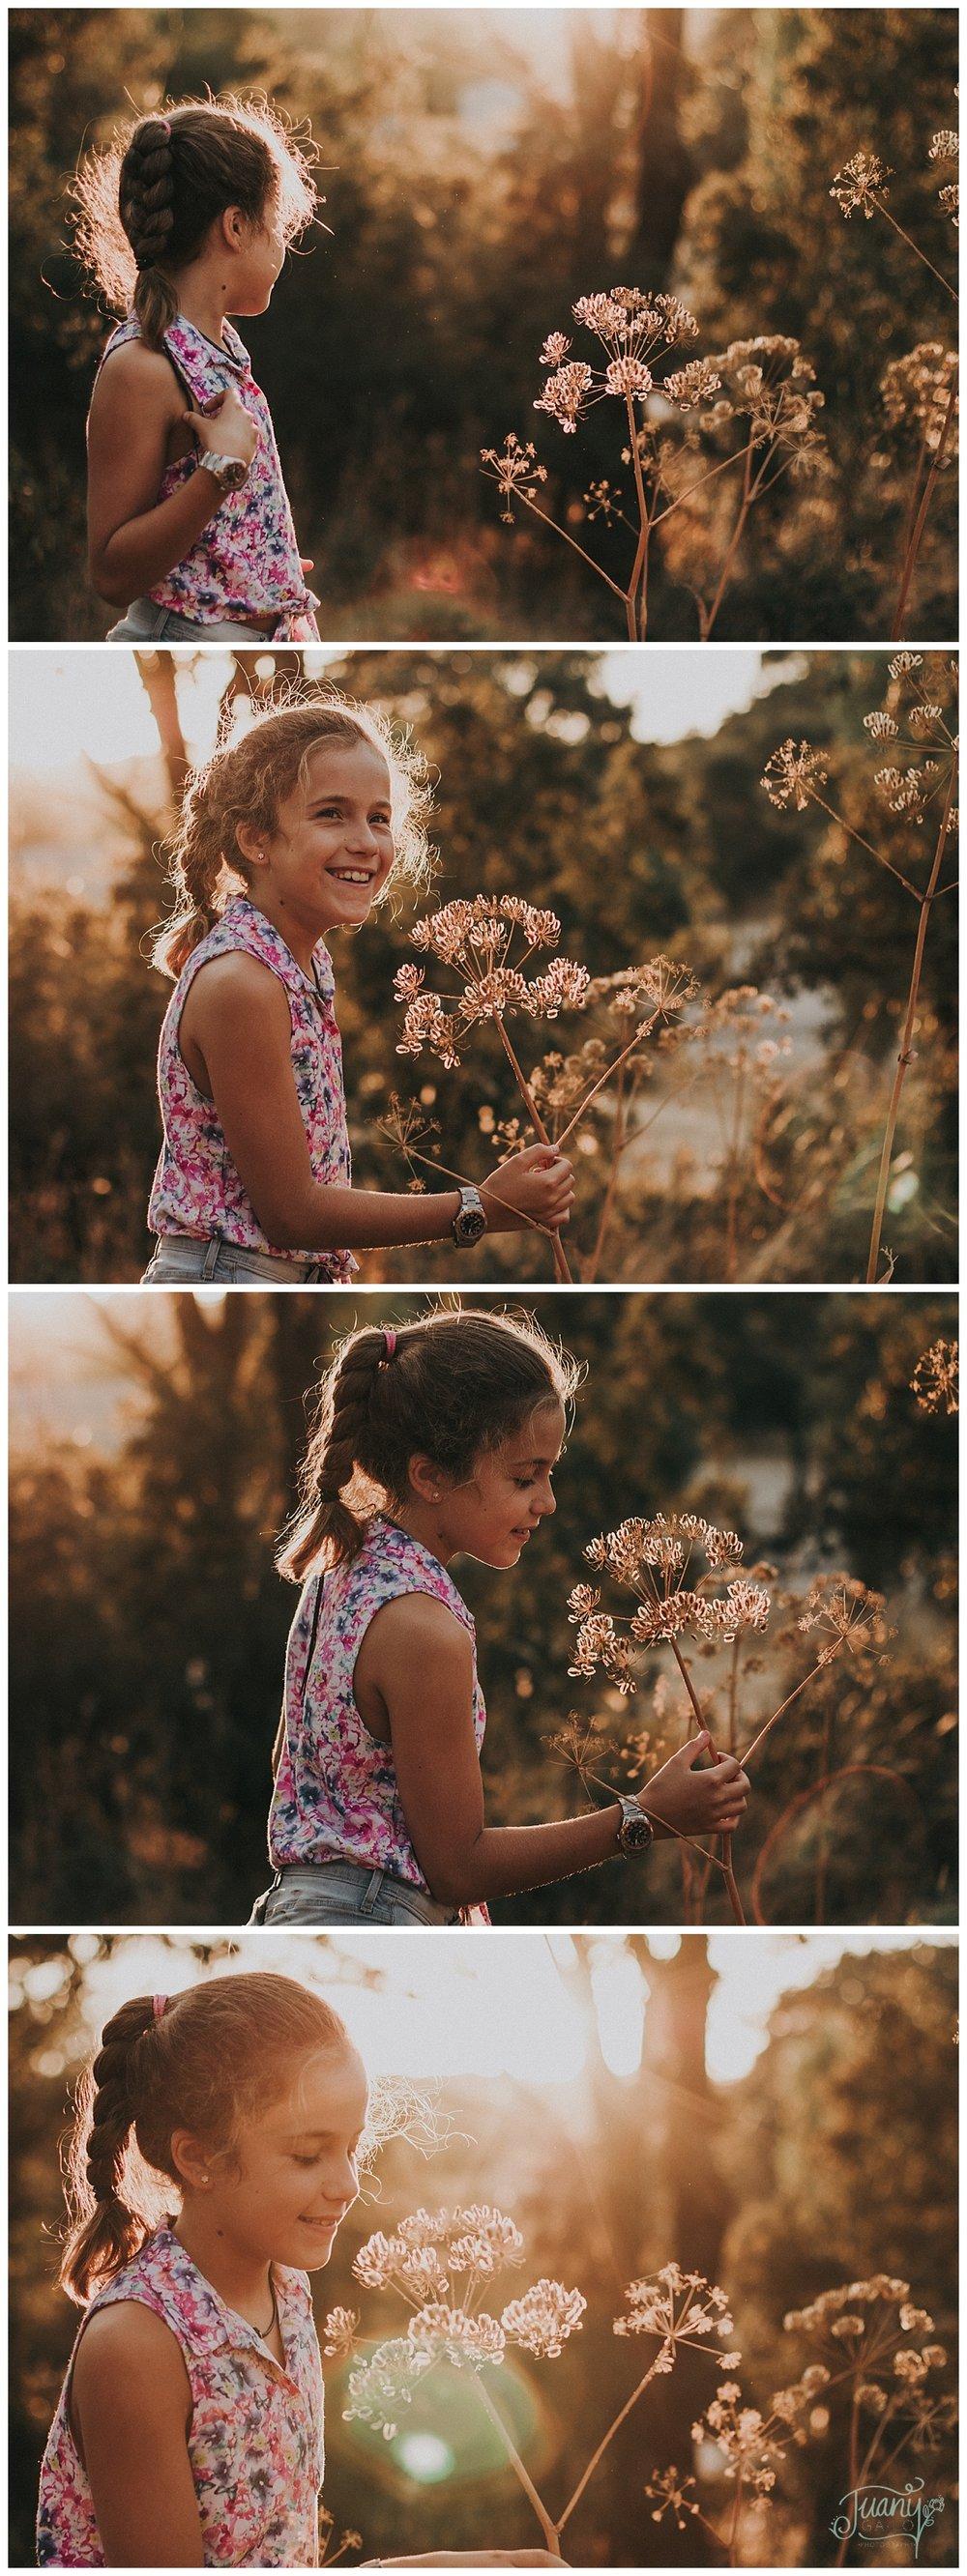 Sesión fotográfica infantil de Mencía_0035.jpg